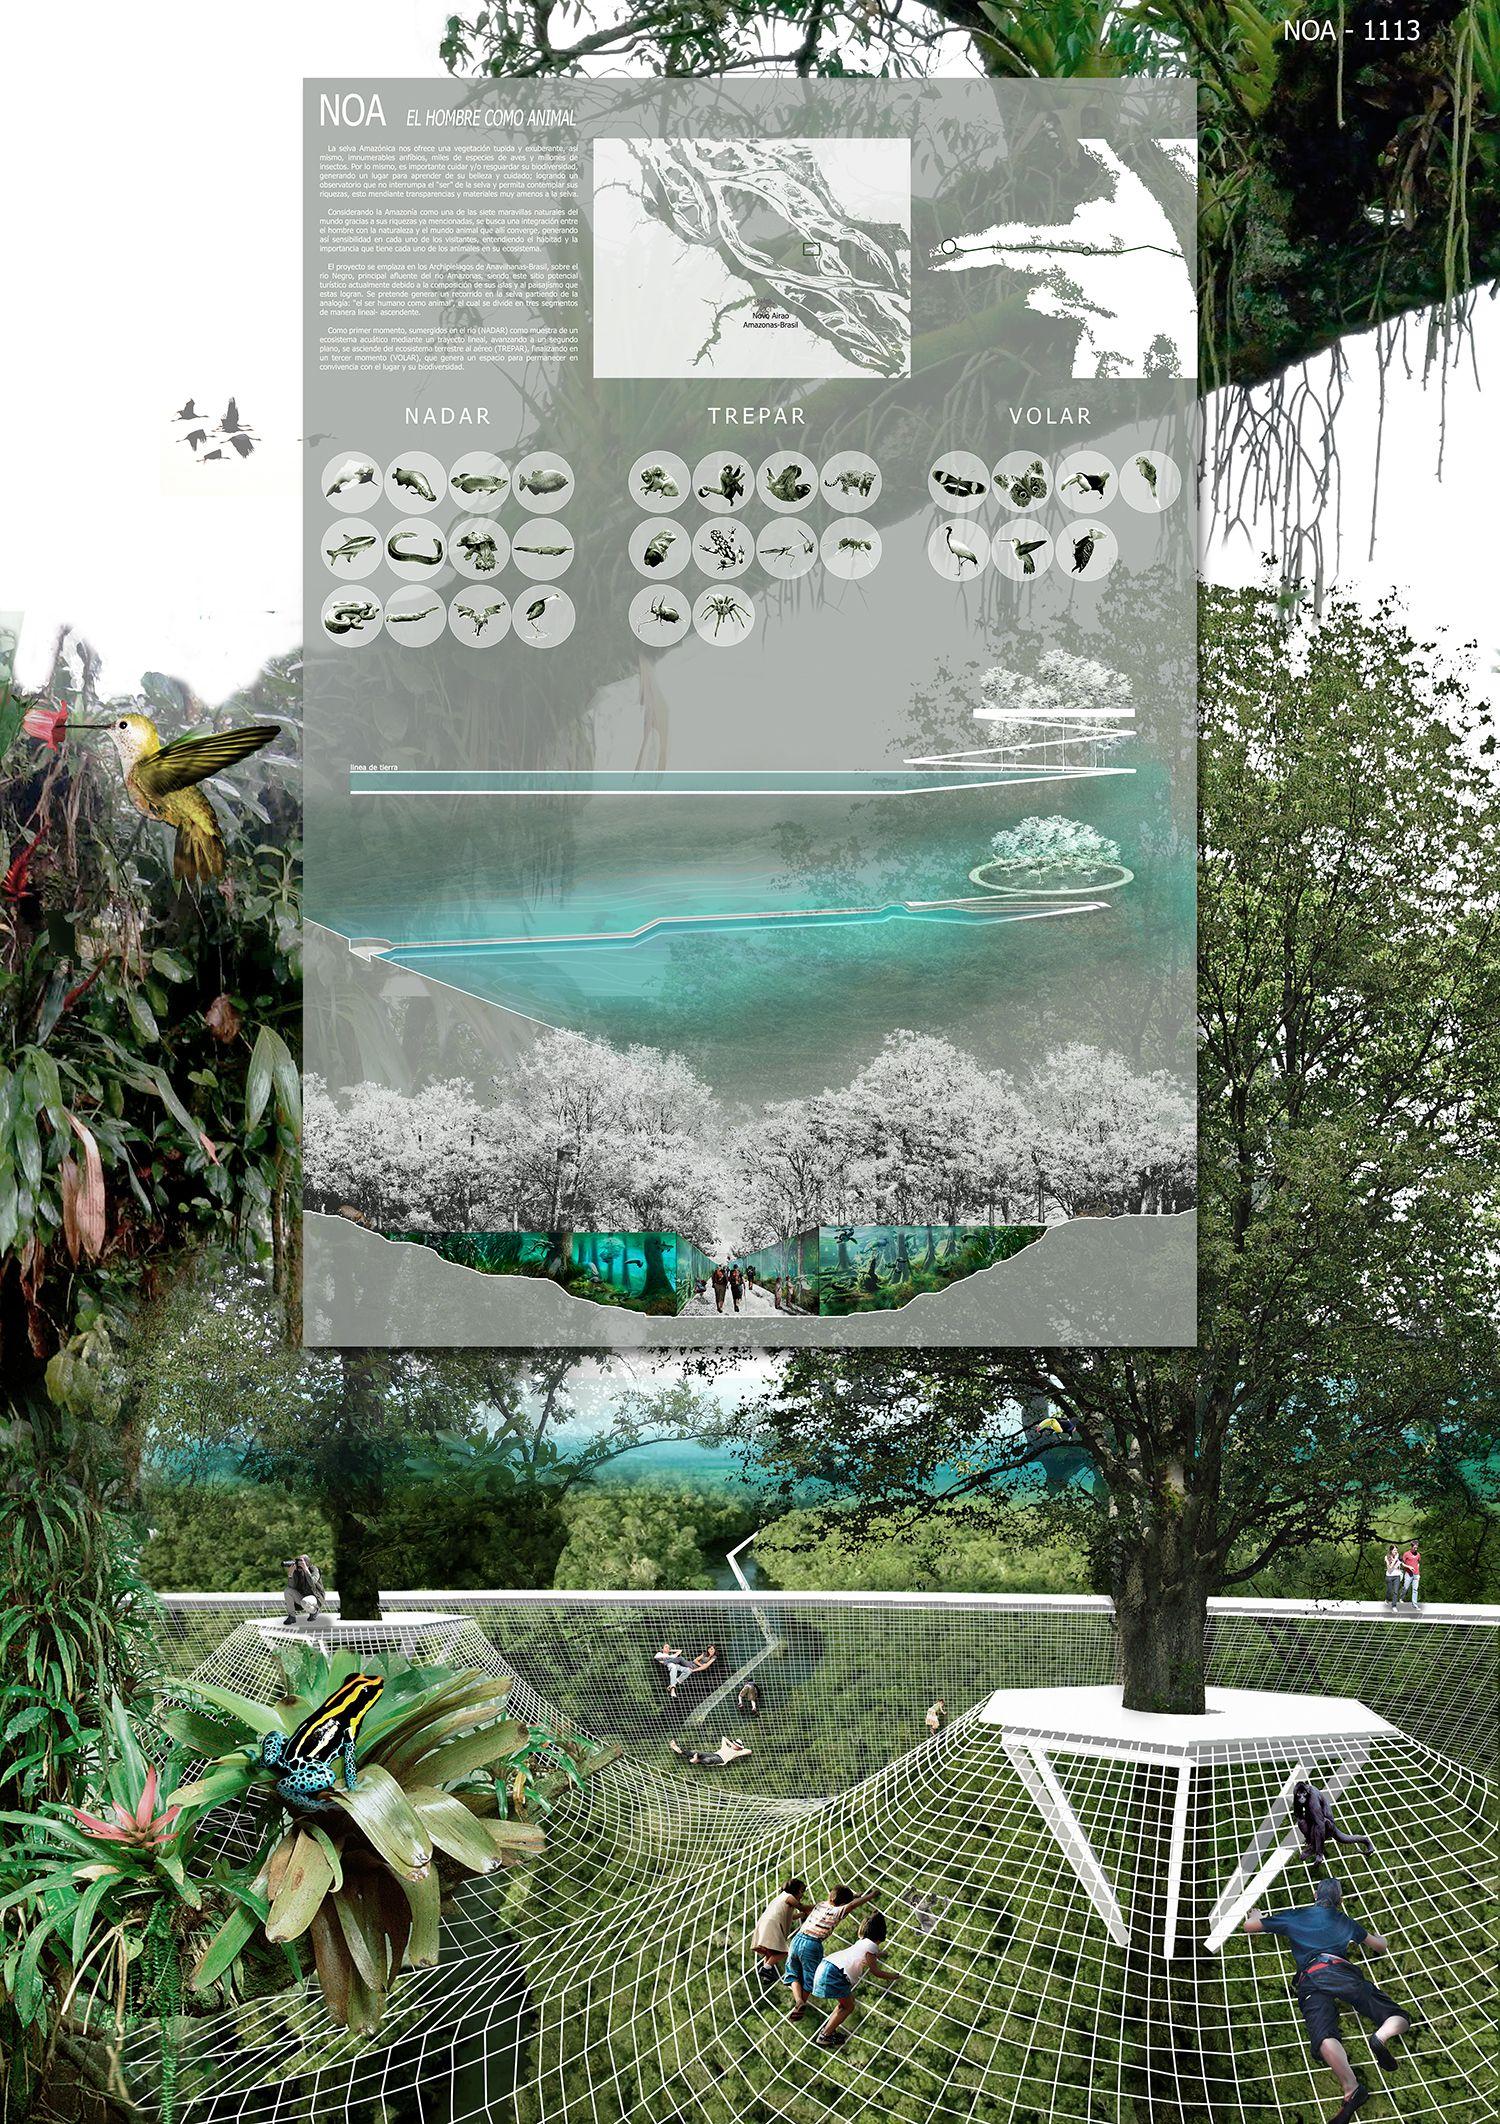 Pin De Franchesco Pulgarin En Planchas Concurso De Arquitectura Arquitectura Ecosistema Acuático